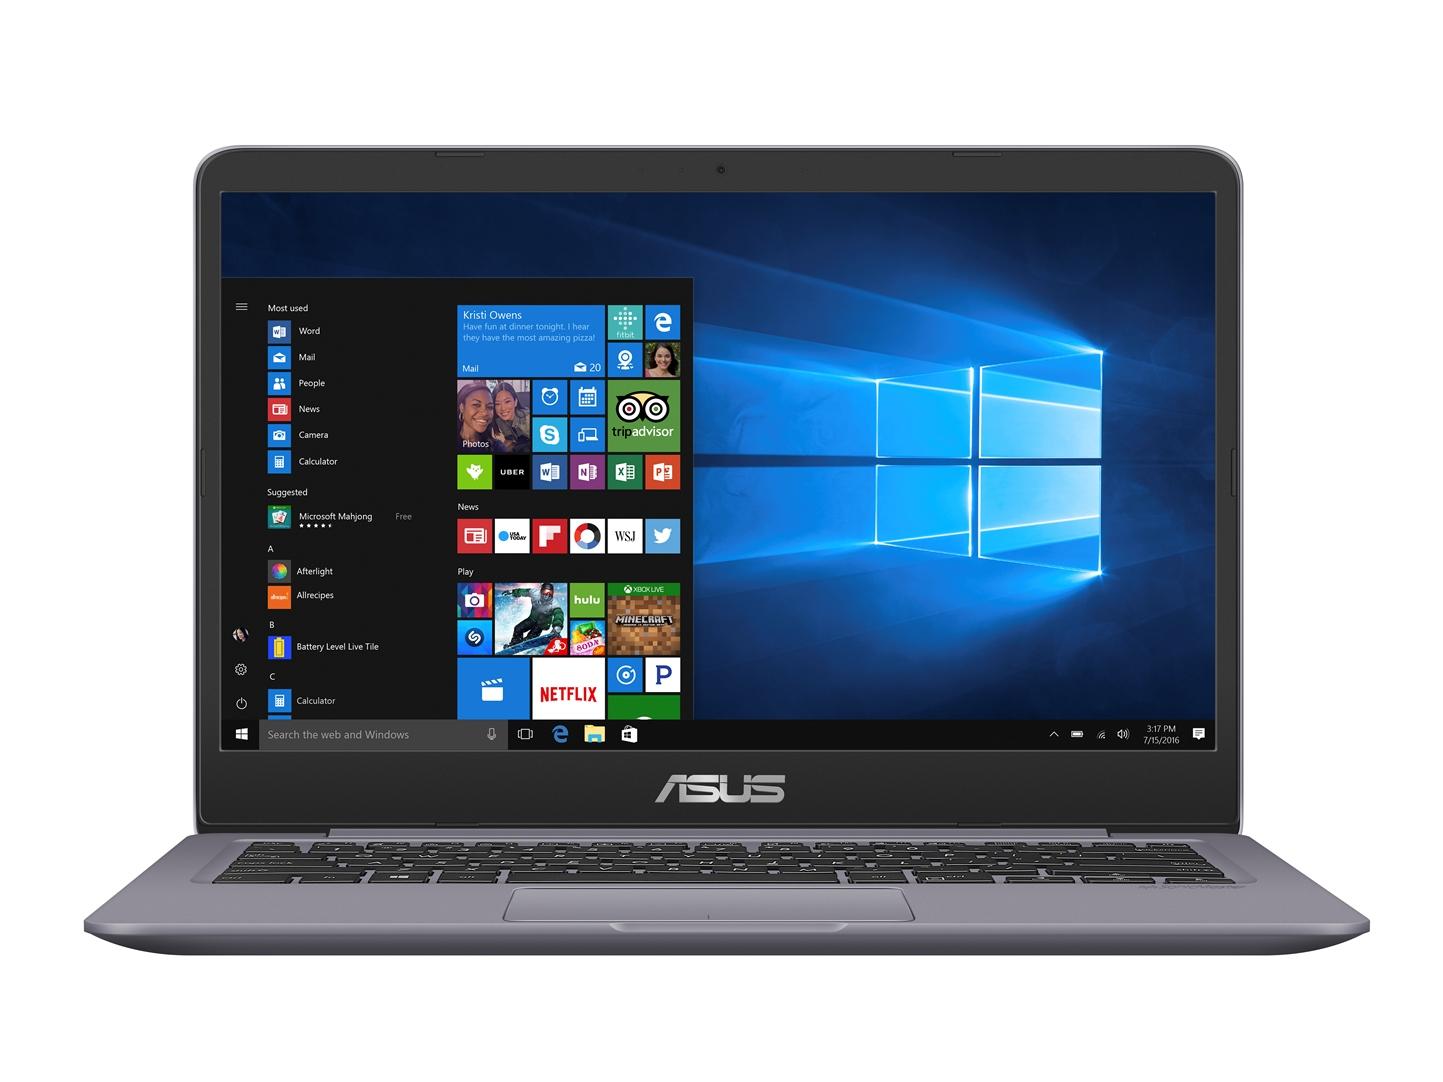 "ASUS S410UA-EB092T i5-8250U/4G/256G SSD SATA3/ /14"" TN/FHD/W10/Grey"